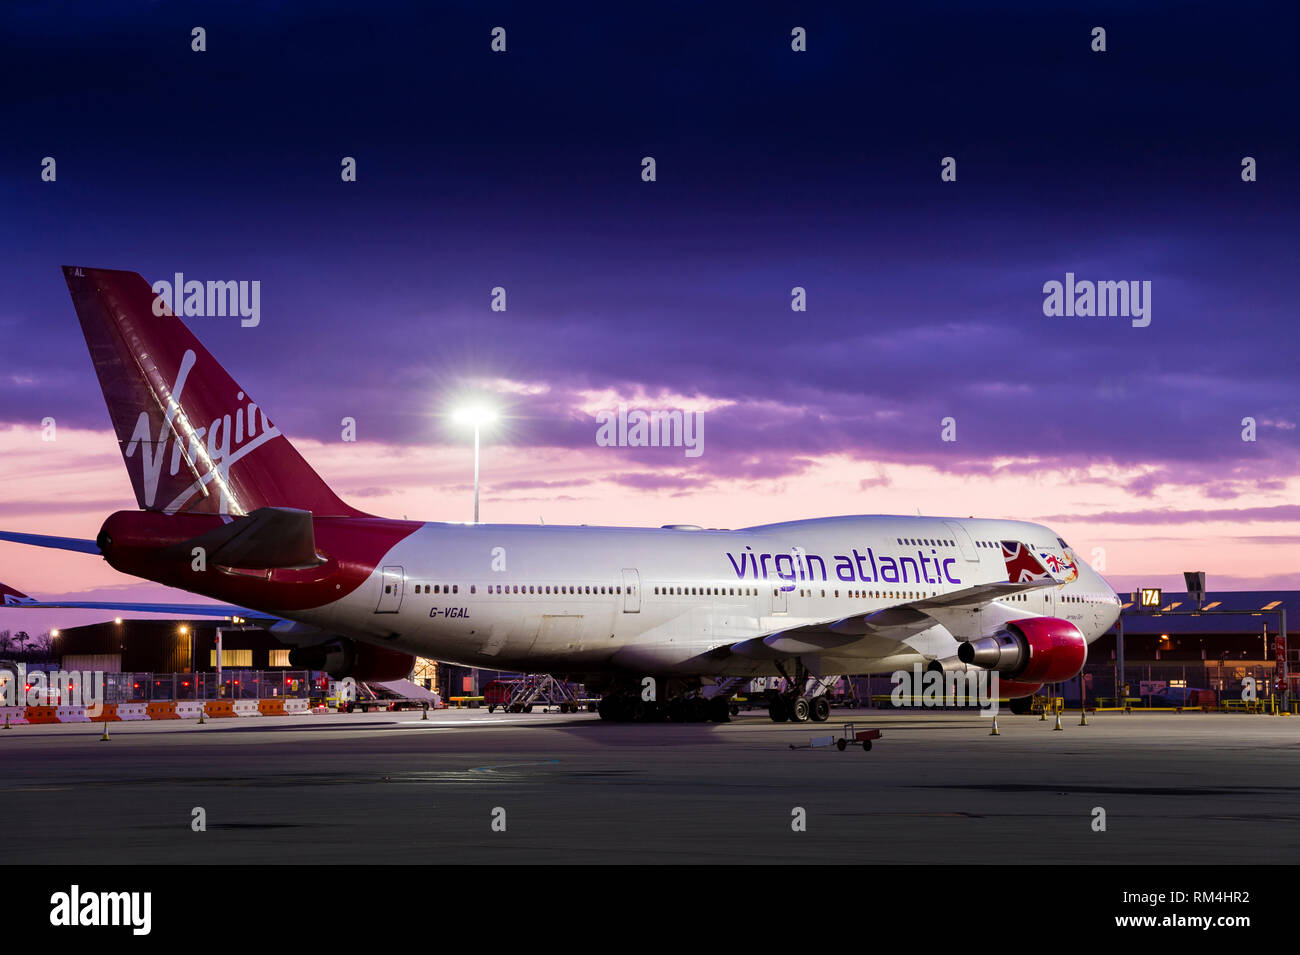 Virgin Atlantic aeroplane waiting on the apron at Gatwick airport at dusk. - Stock Image